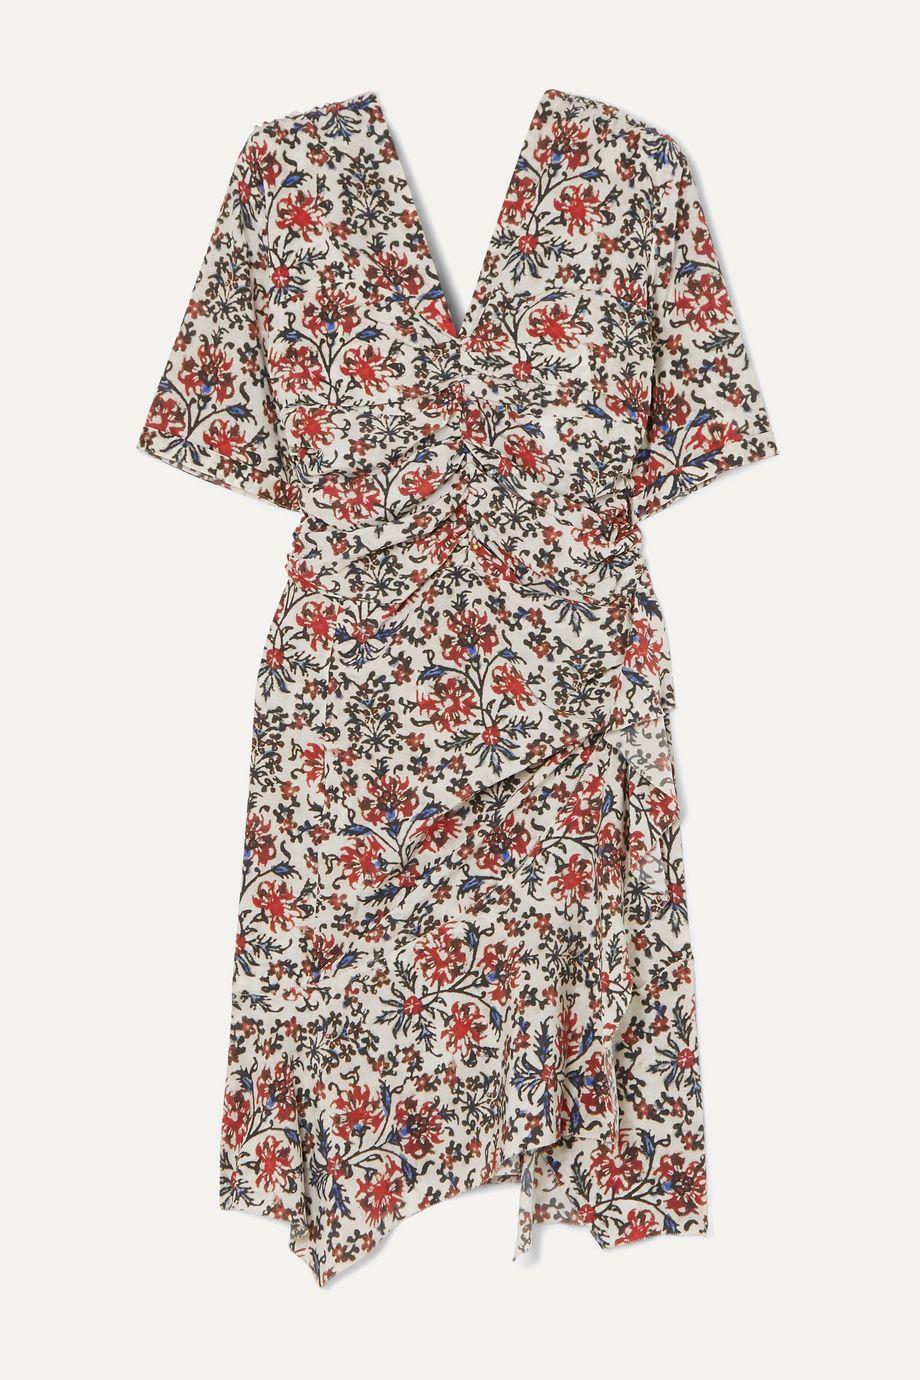 Isabel Marant Arodie ruched floral-print silk-blend crepe dress